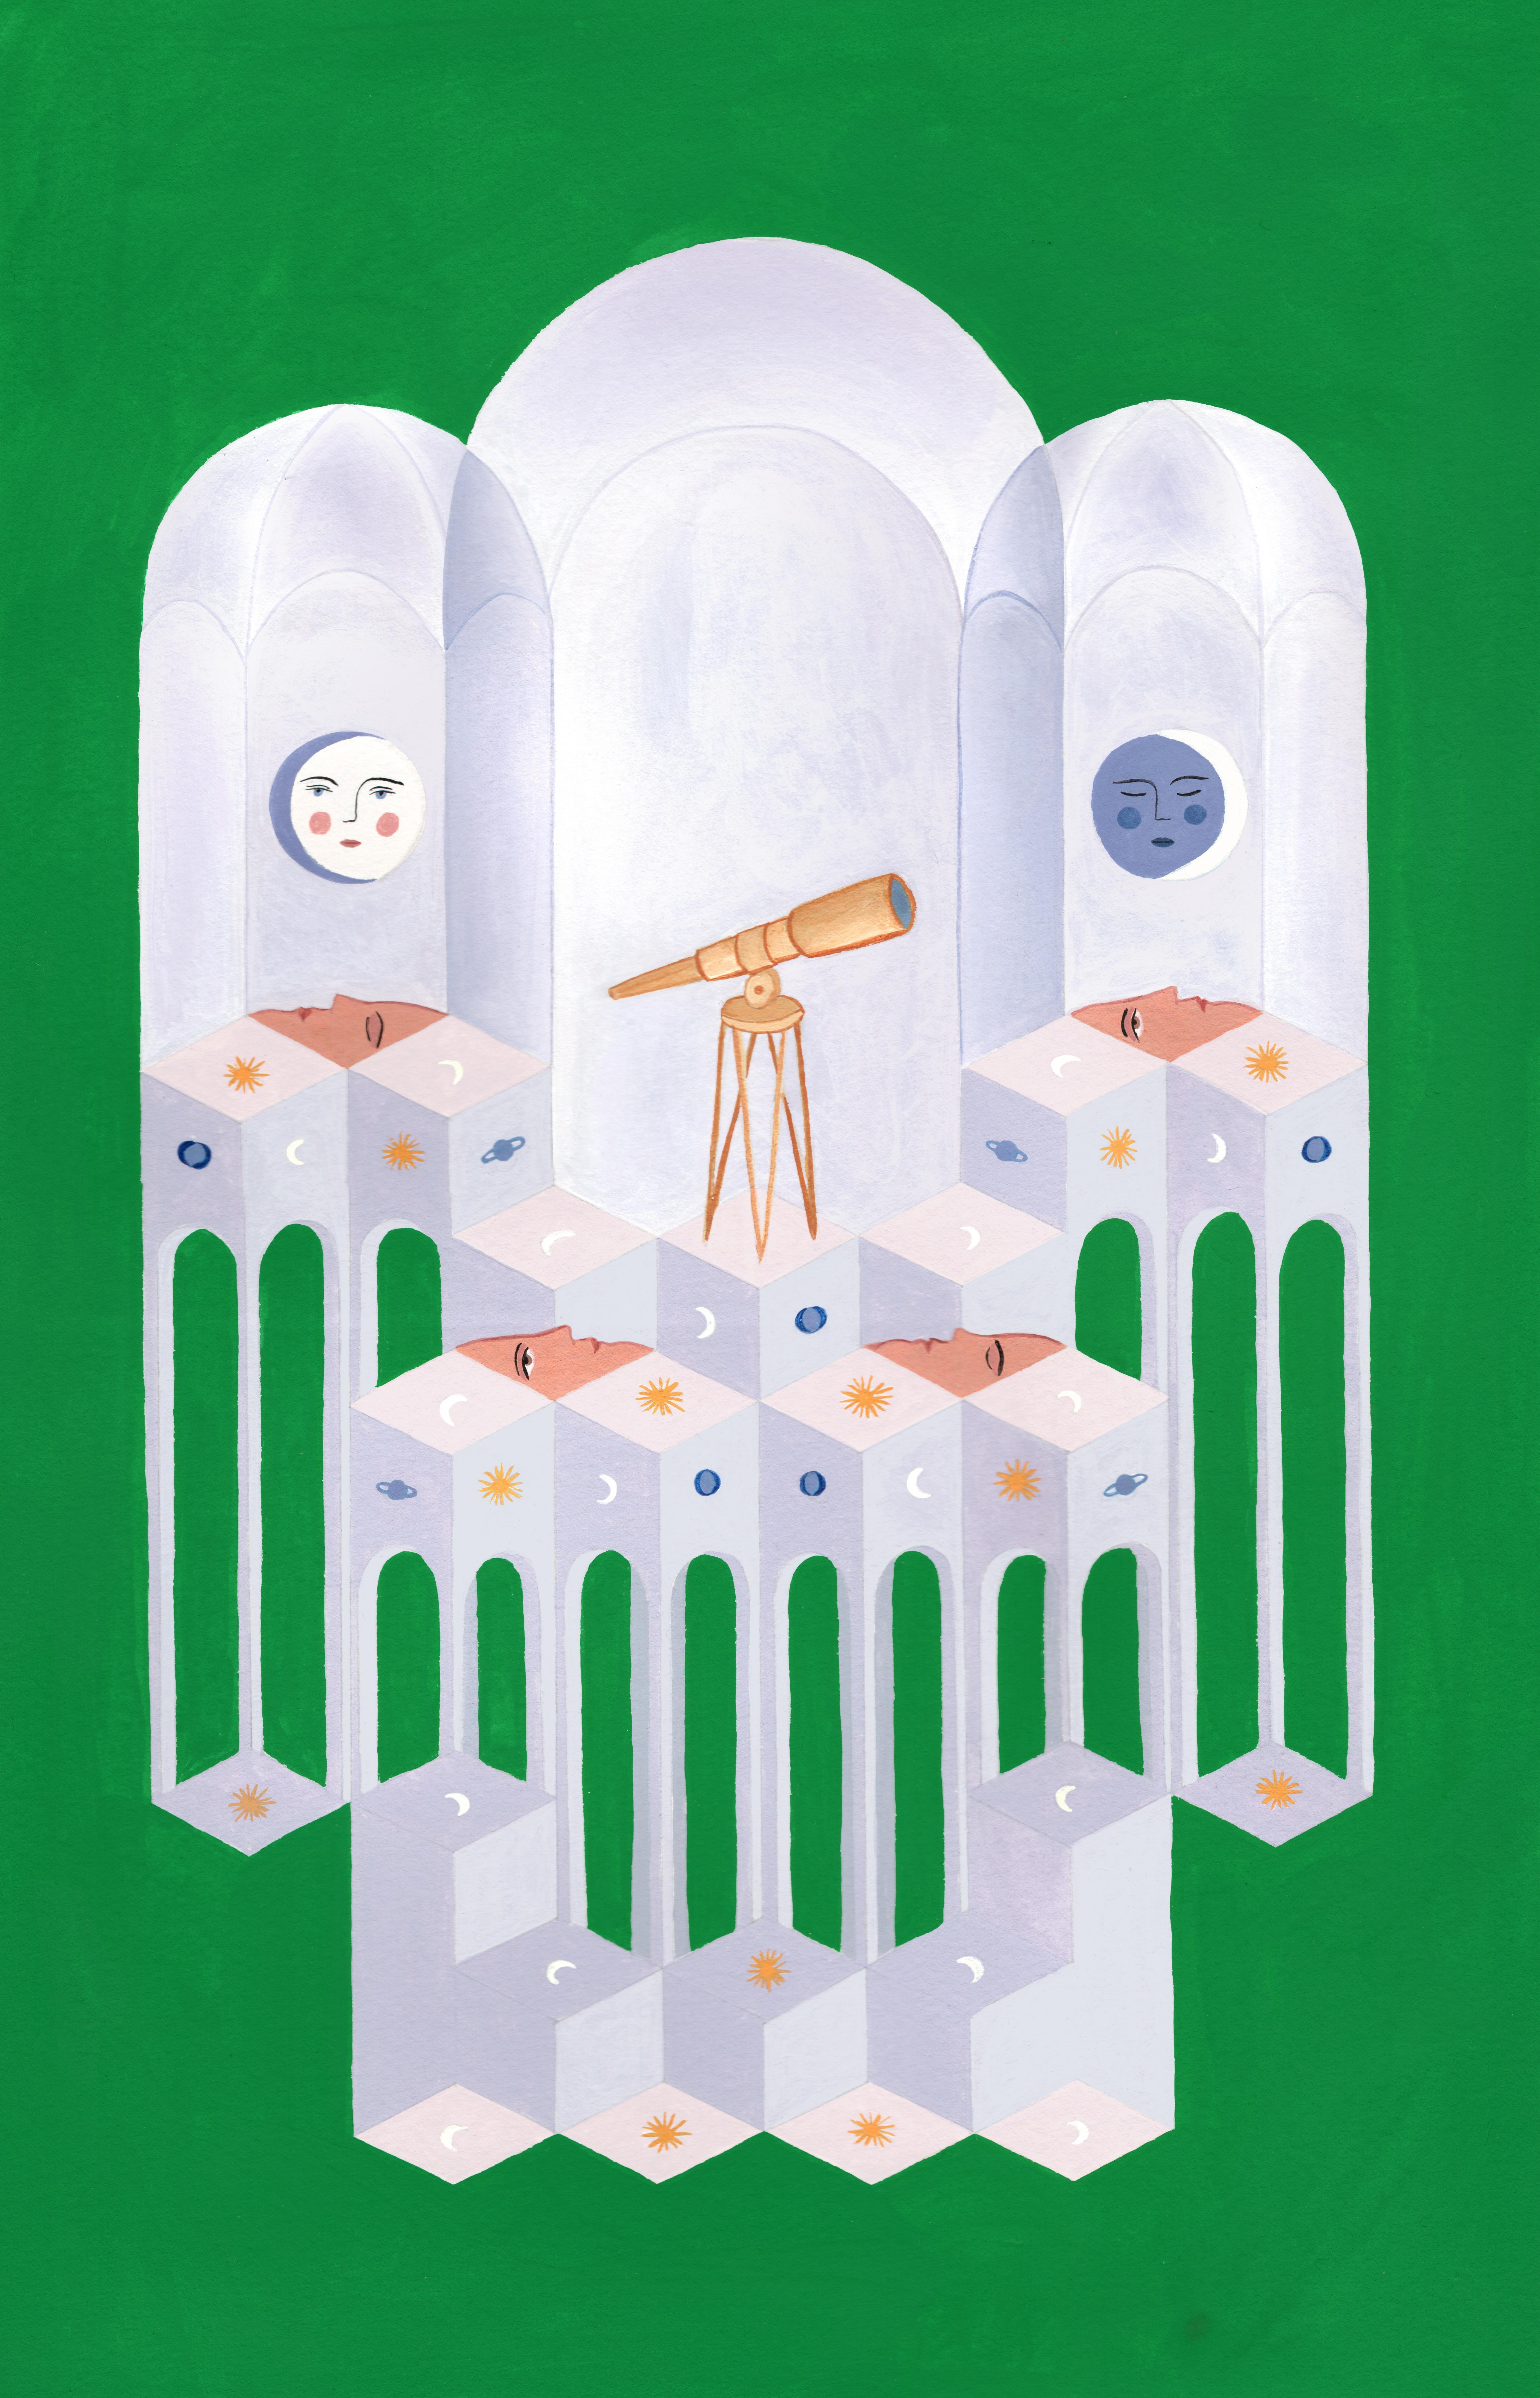 L'observatoire by Isabelle Feliu